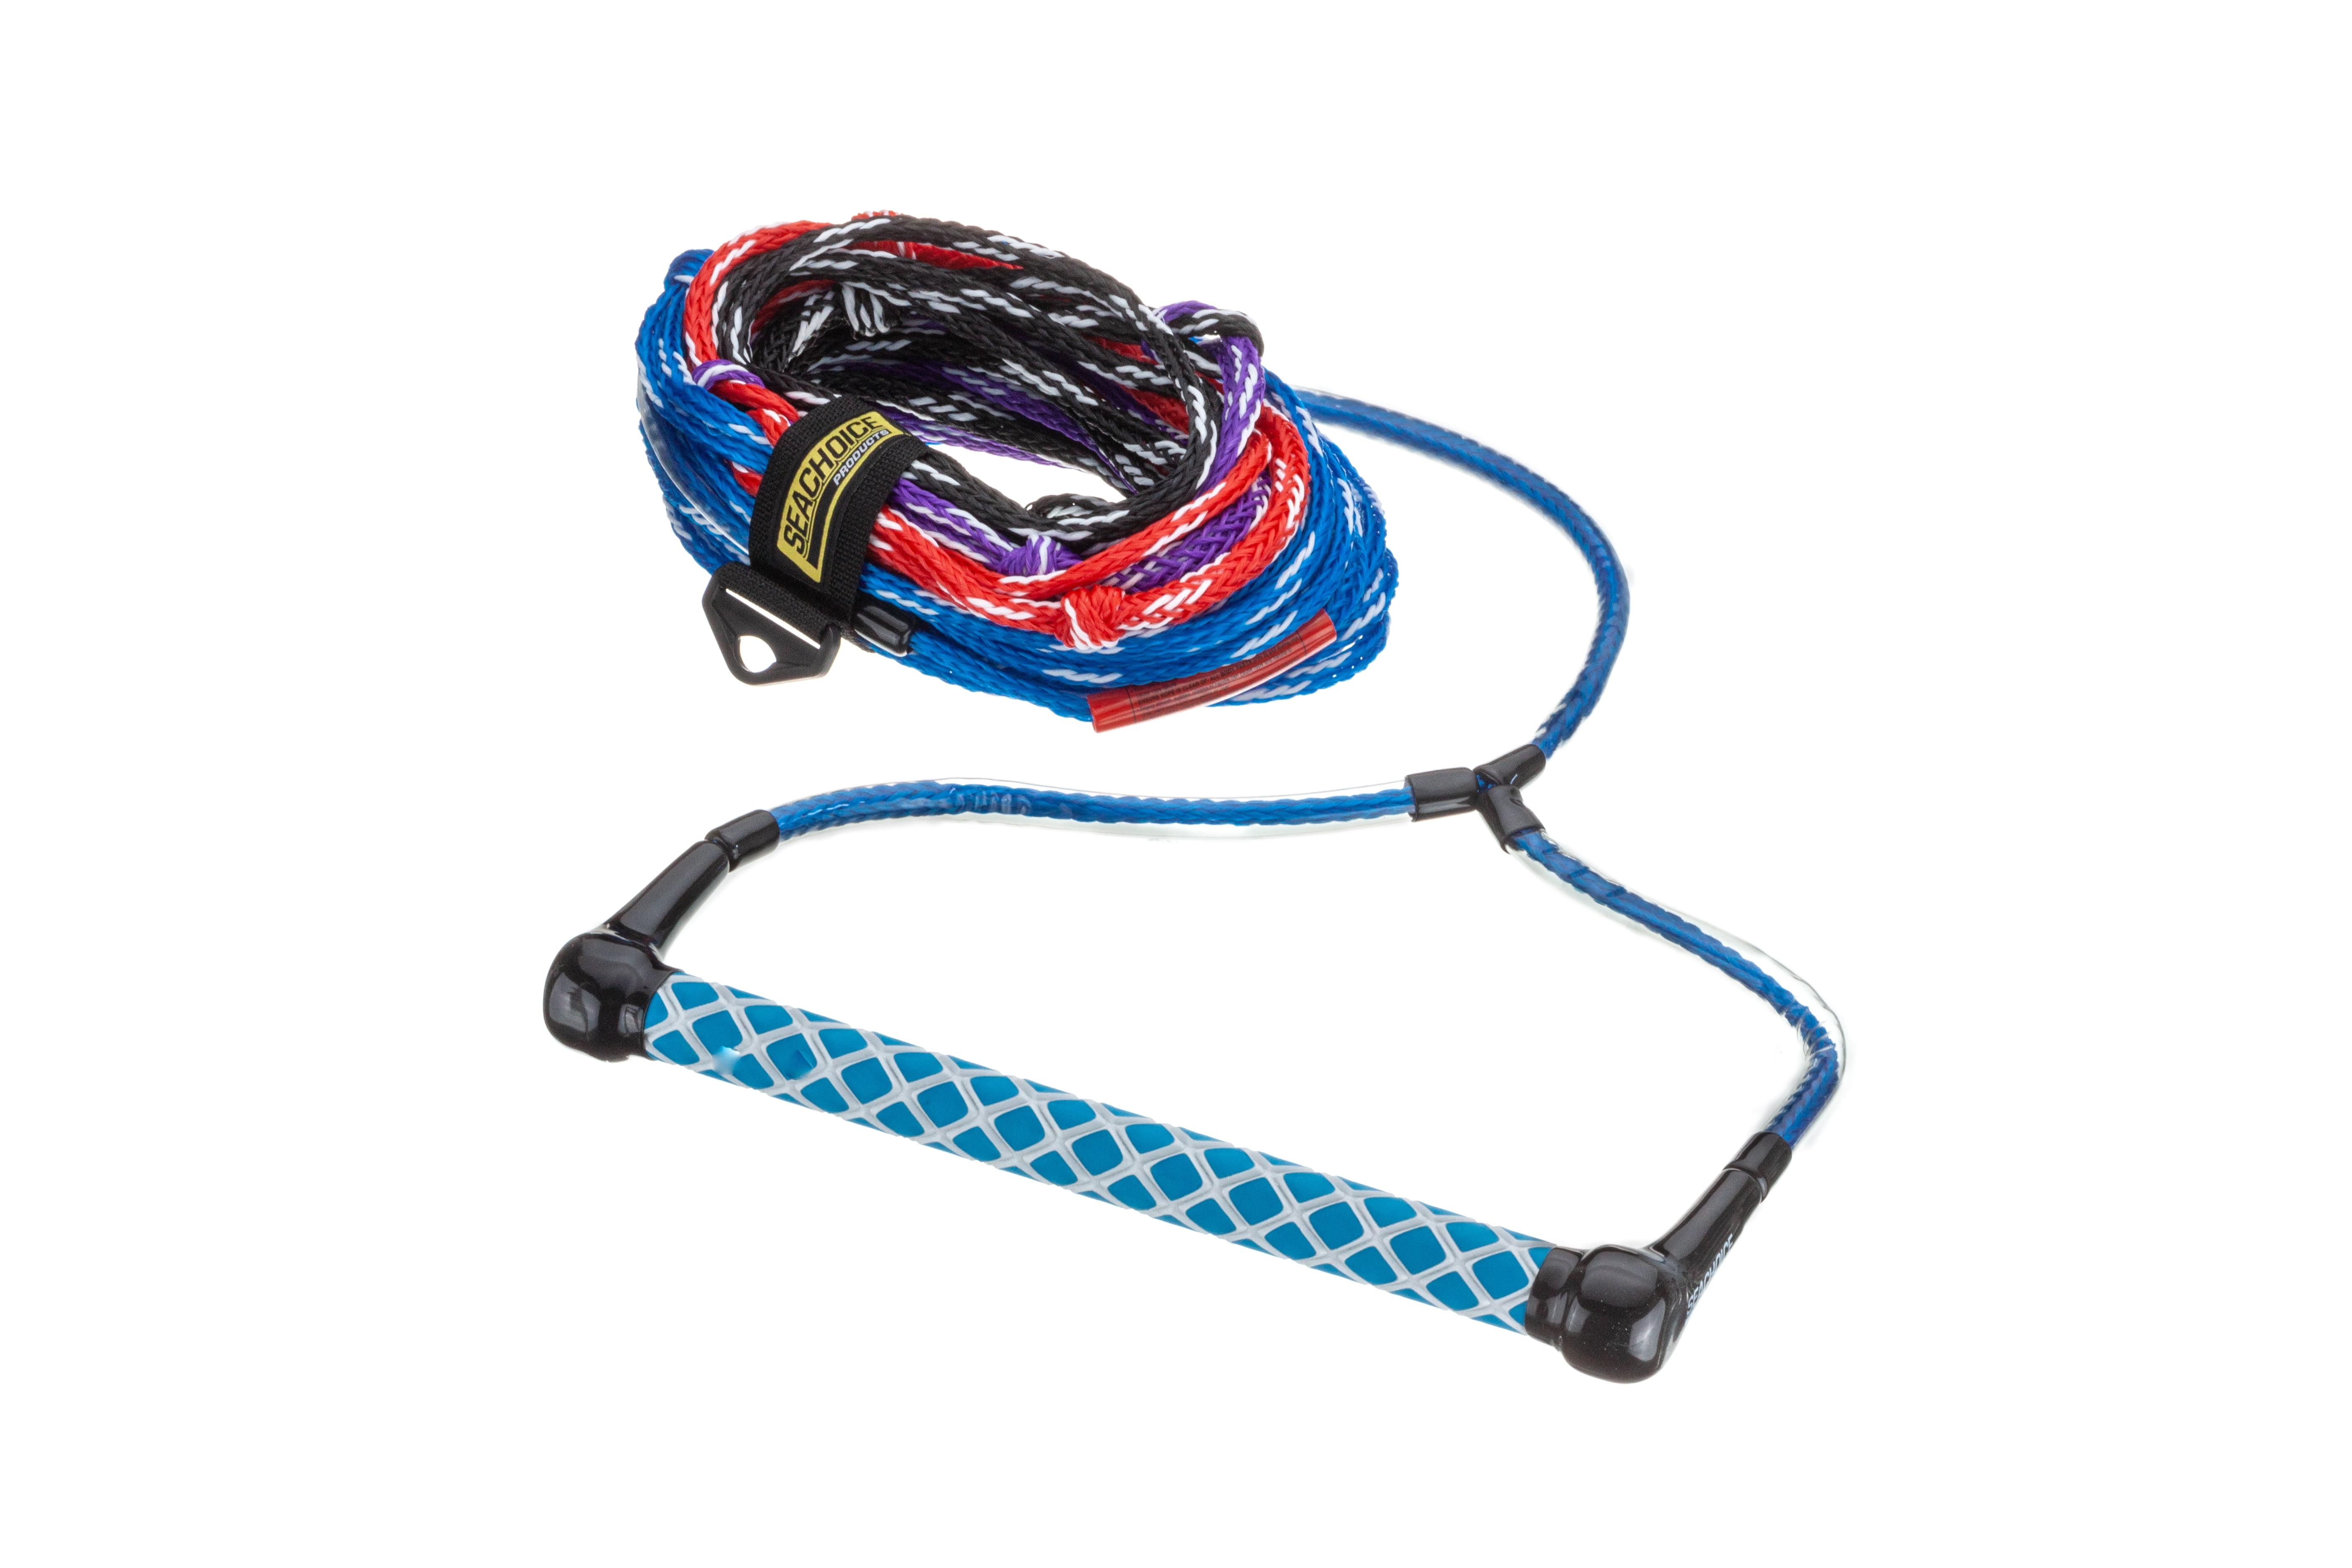 Seachoice Seachoice 86731 Water Ski Rope 75 Feet Long 12 Inch Handle with Rubber Grip